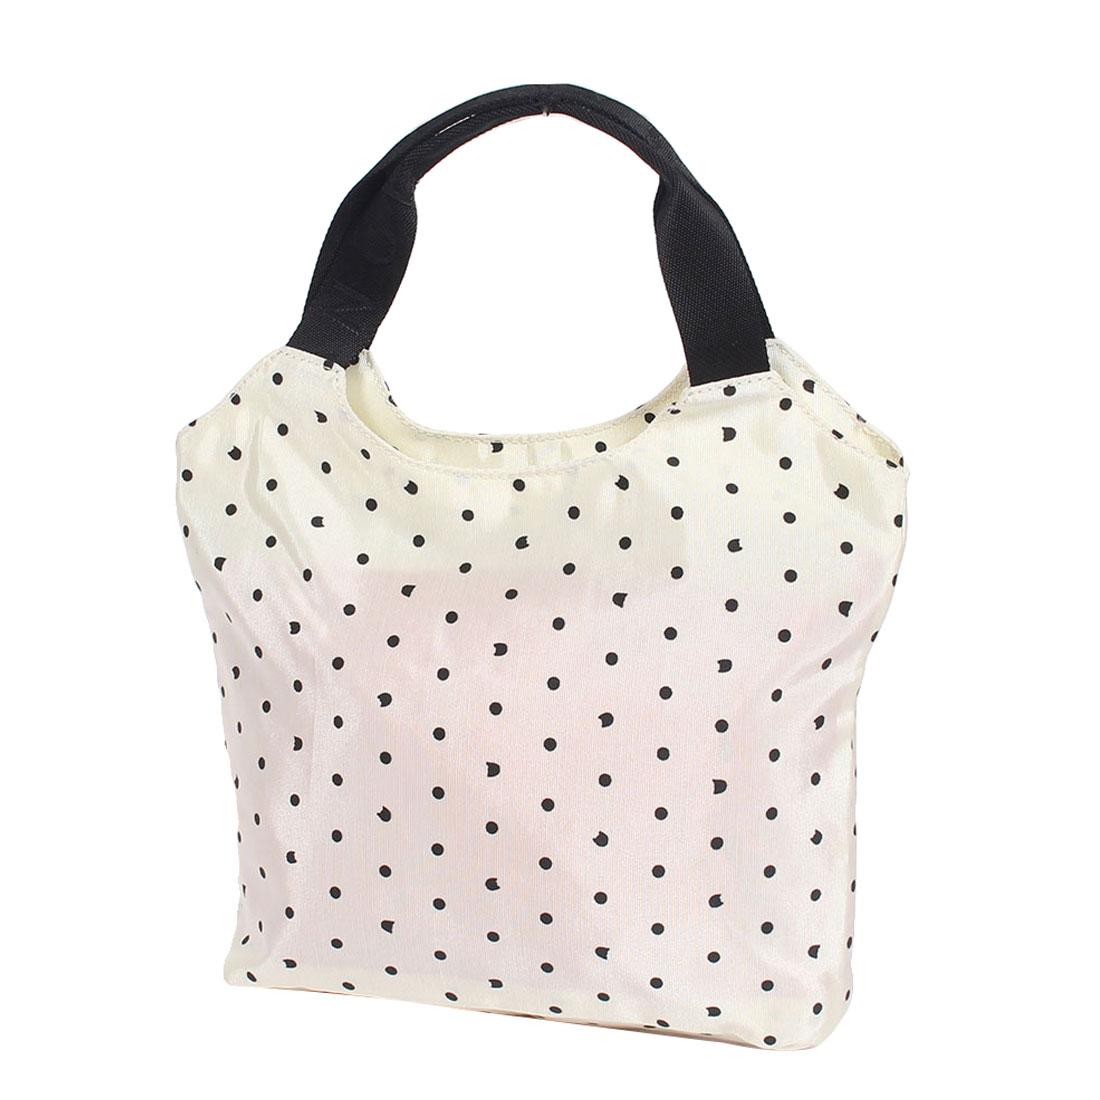 Dot Pattern Shopping Travelling Single Shoulder Bag Tote Handbag